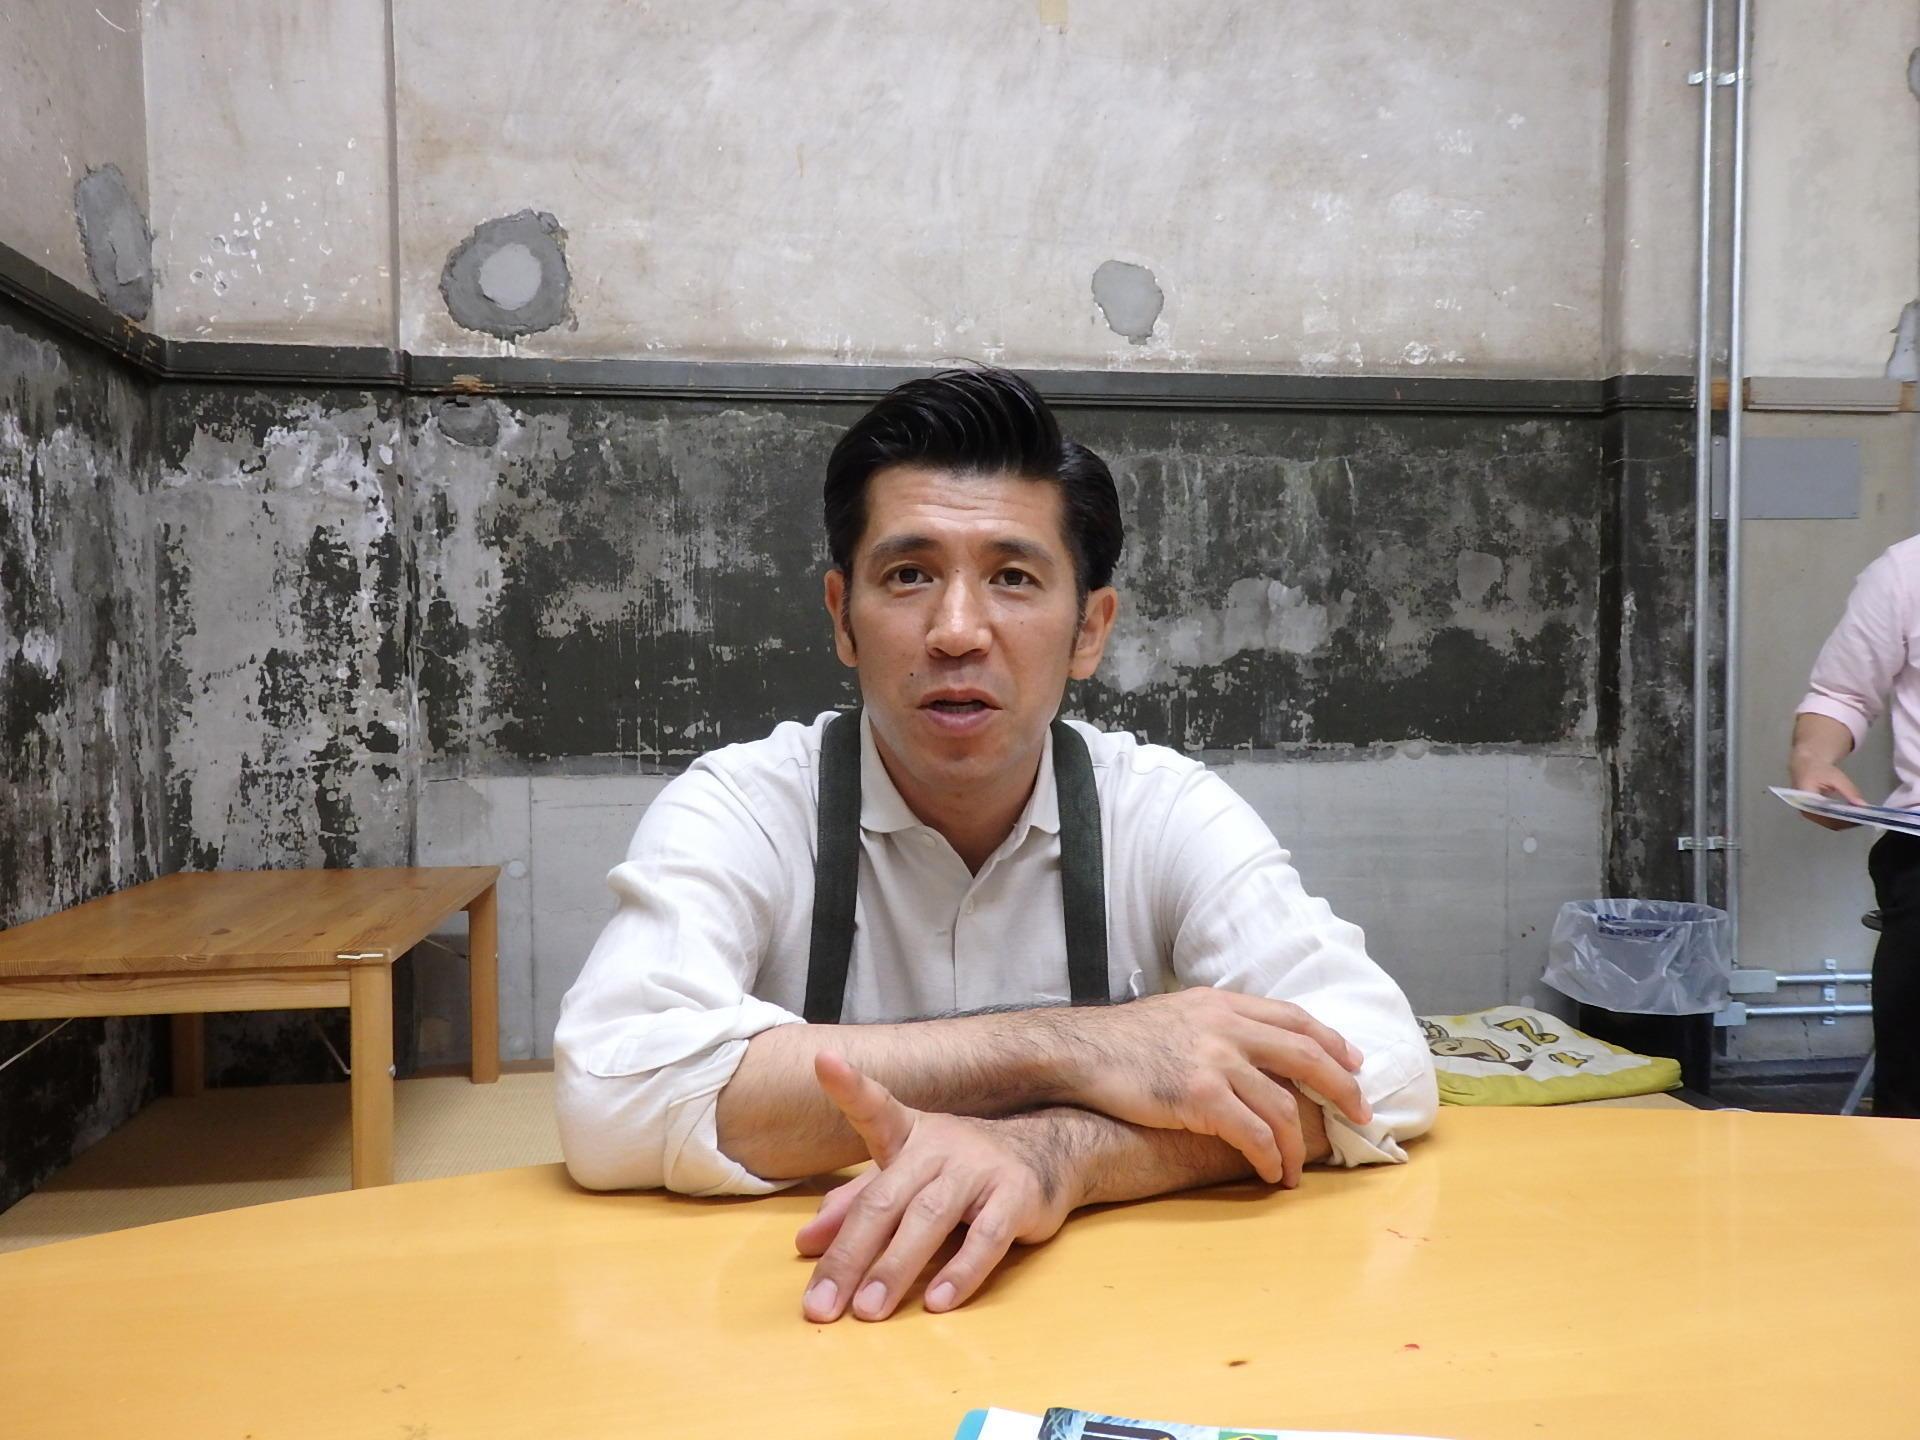 http://news.yoshimoto.co.jp/20160531142810-27d604dfe7ca73638e3b9c361d3a0a0b1edac518.jpg